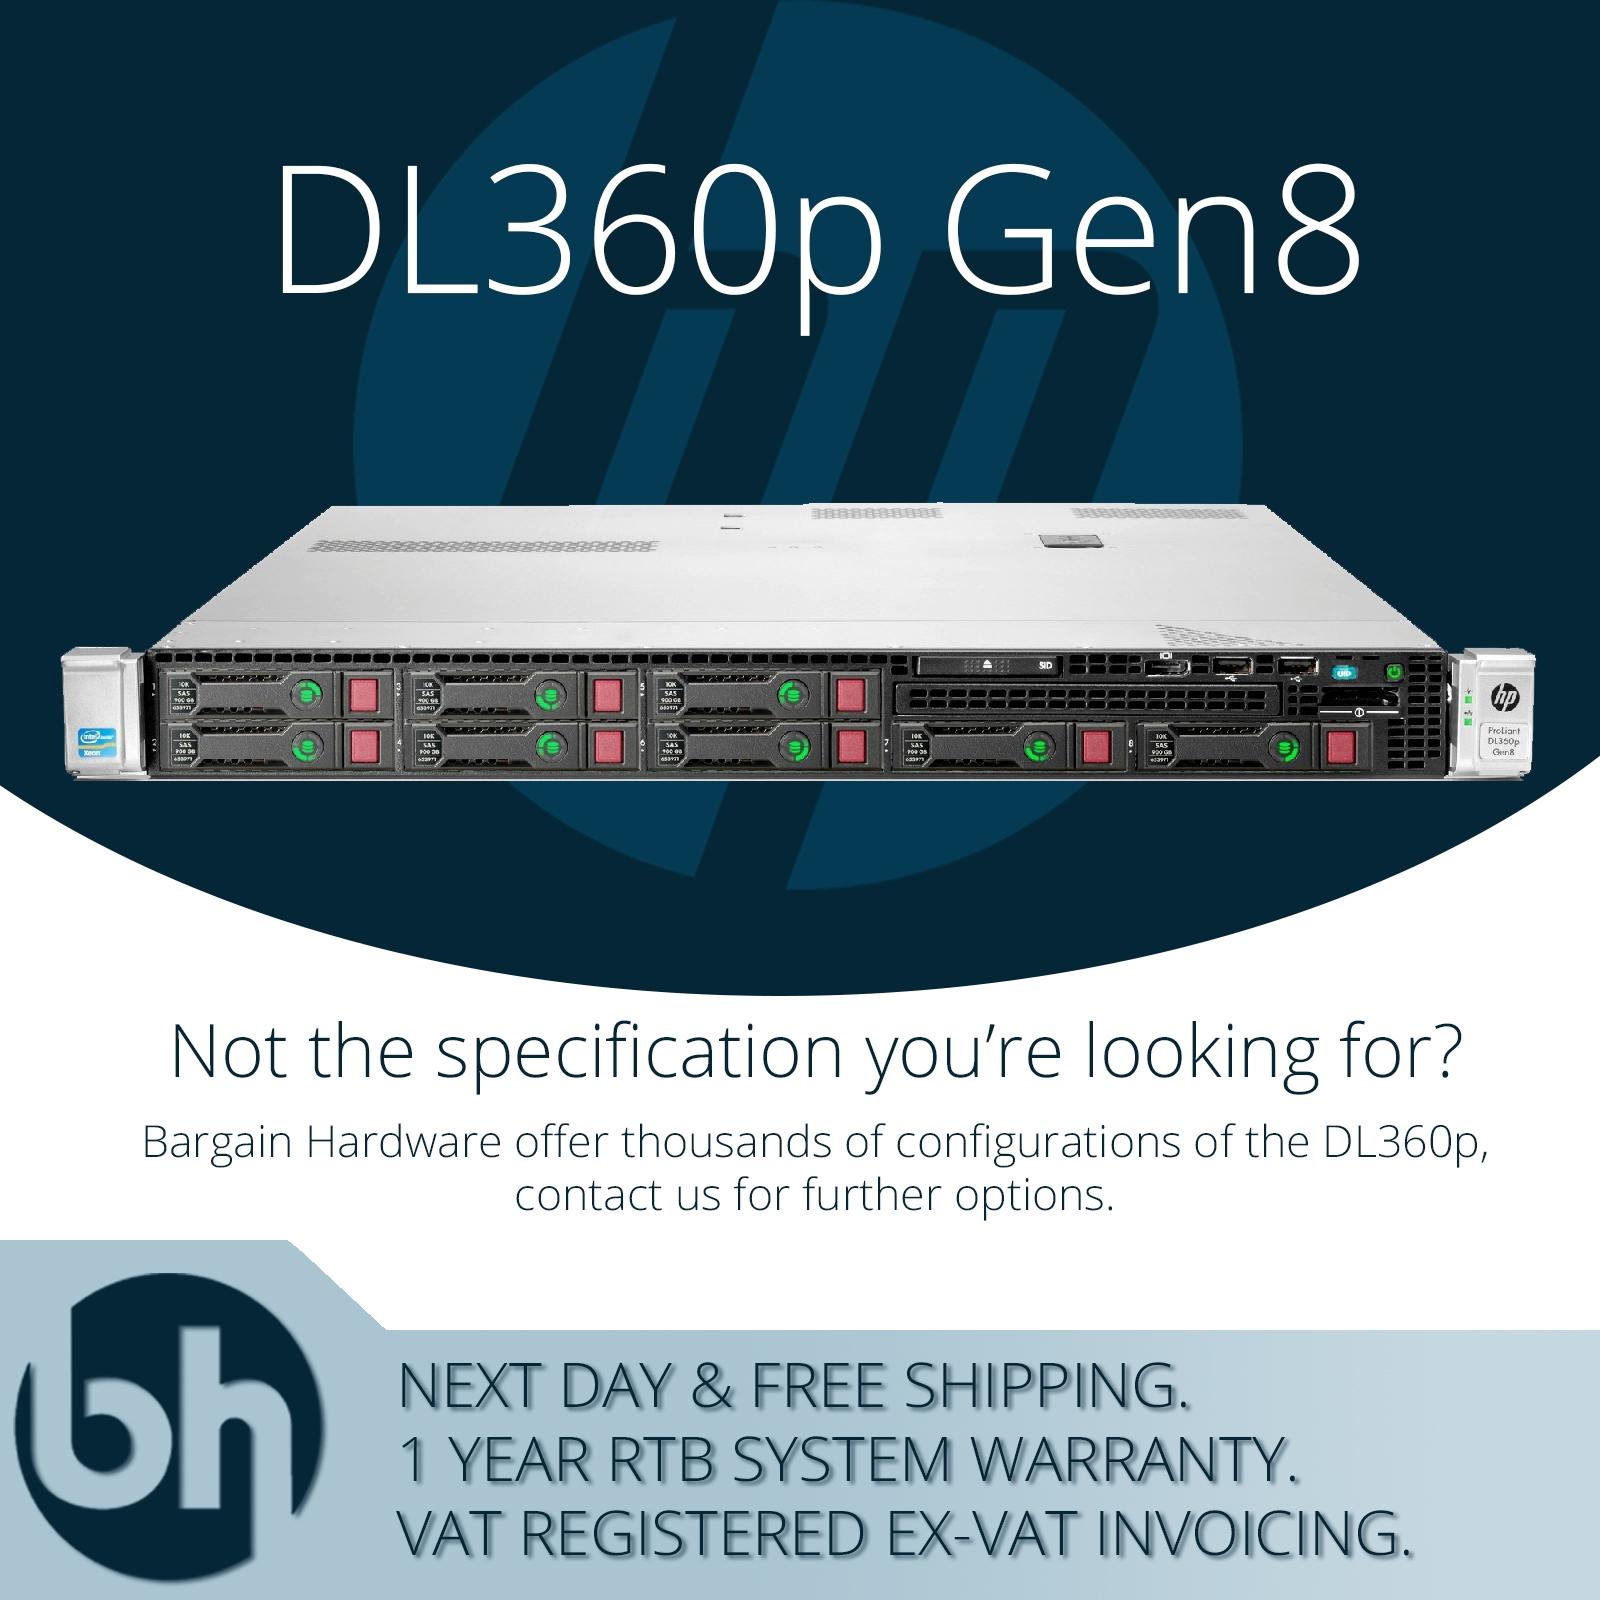 HP PROLIANT DL360P GEN8 BASE SYSTEM DEVICE 64BIT DRIVER DOWNLOAD